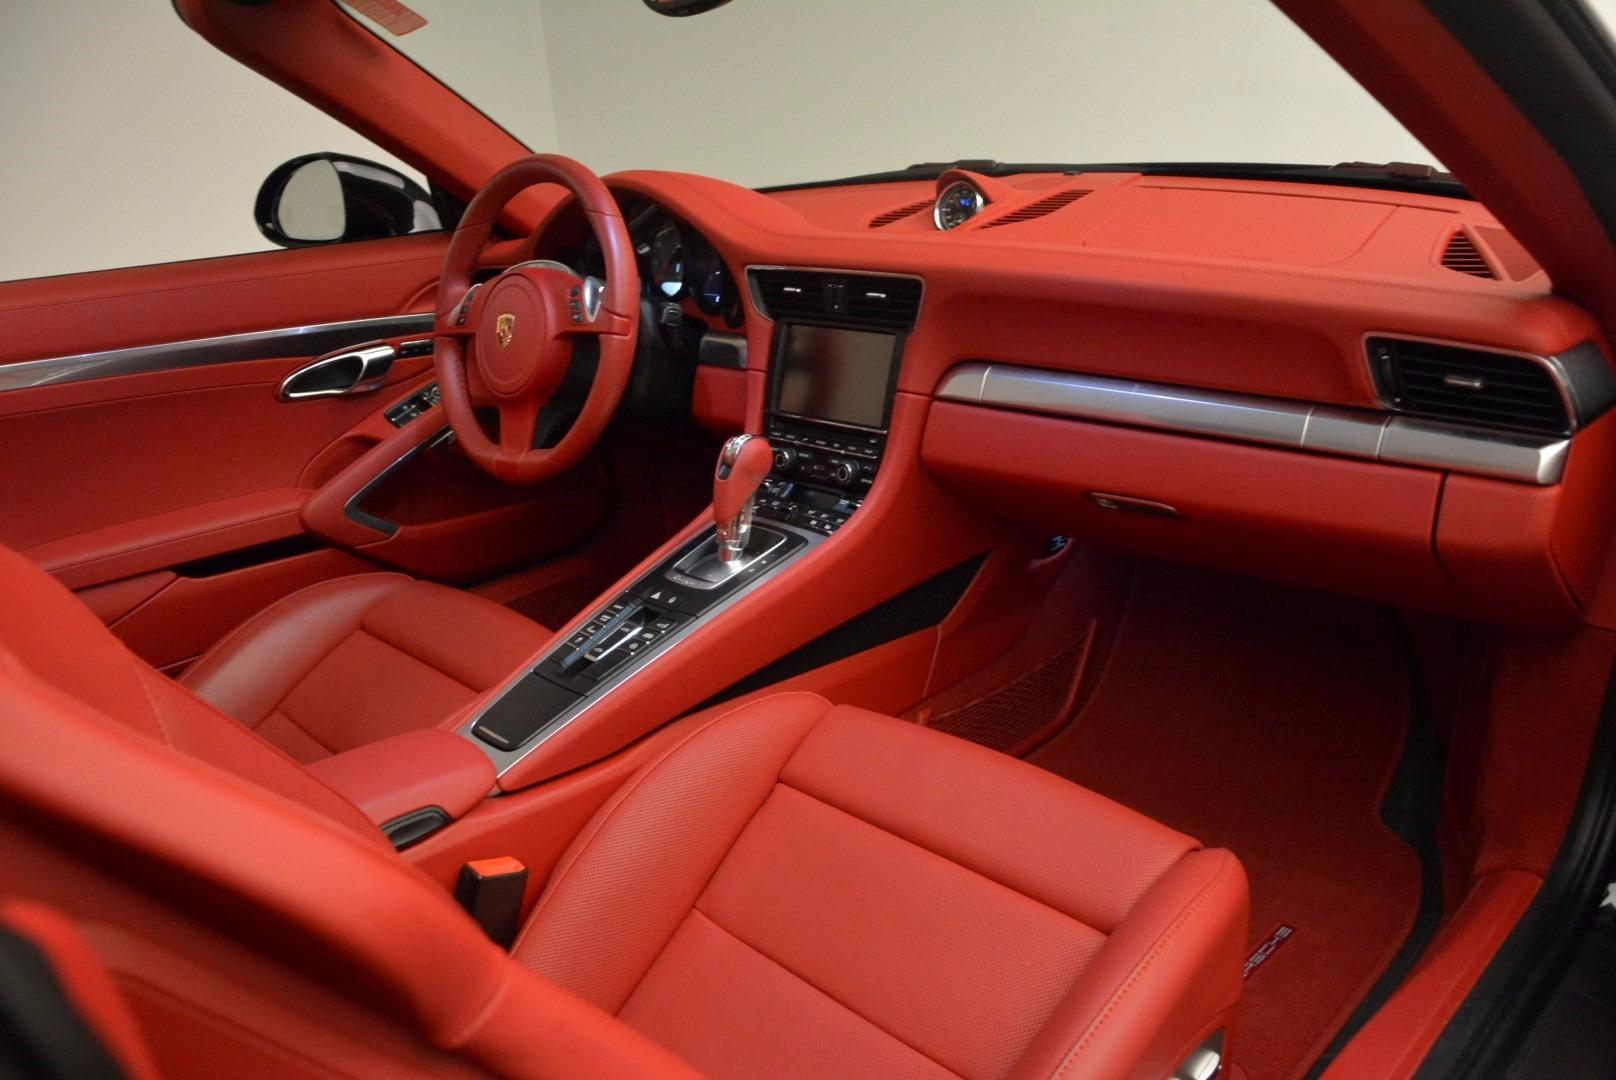 Used 2015 Porsche 911 Targa 4S For Sale In Greenwich, CT 1476_p25